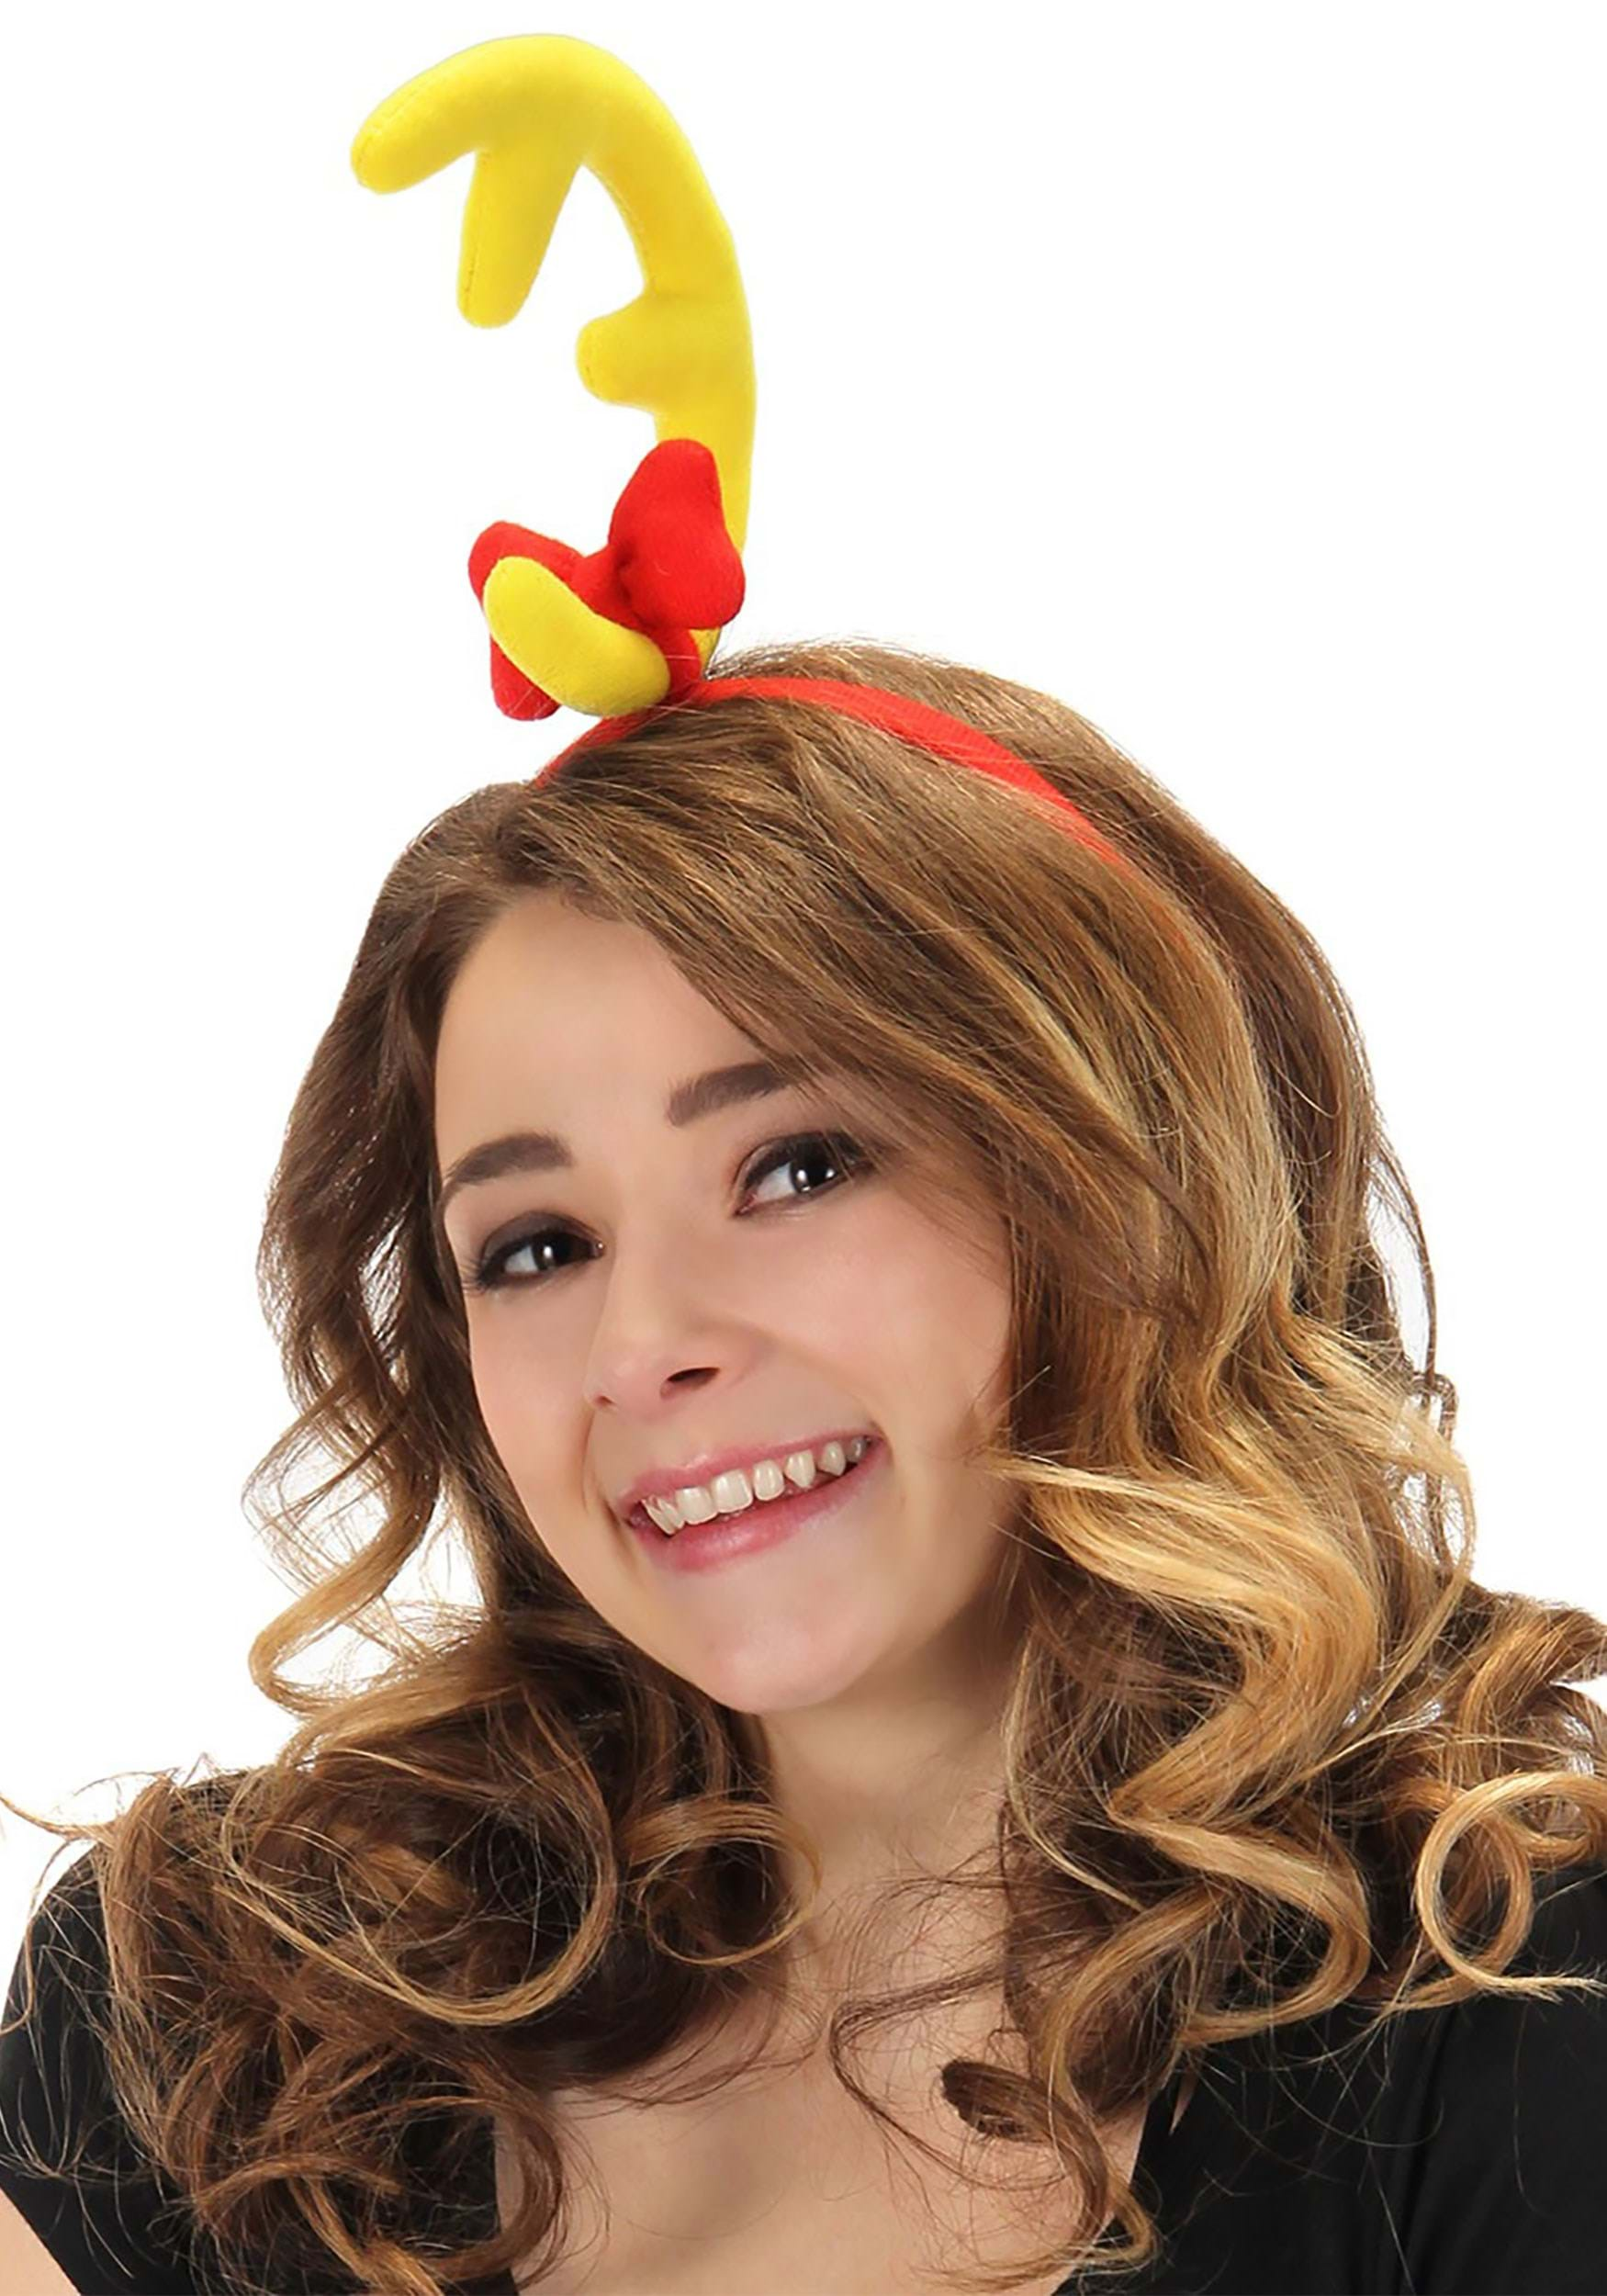 The Grinch Girls Headband